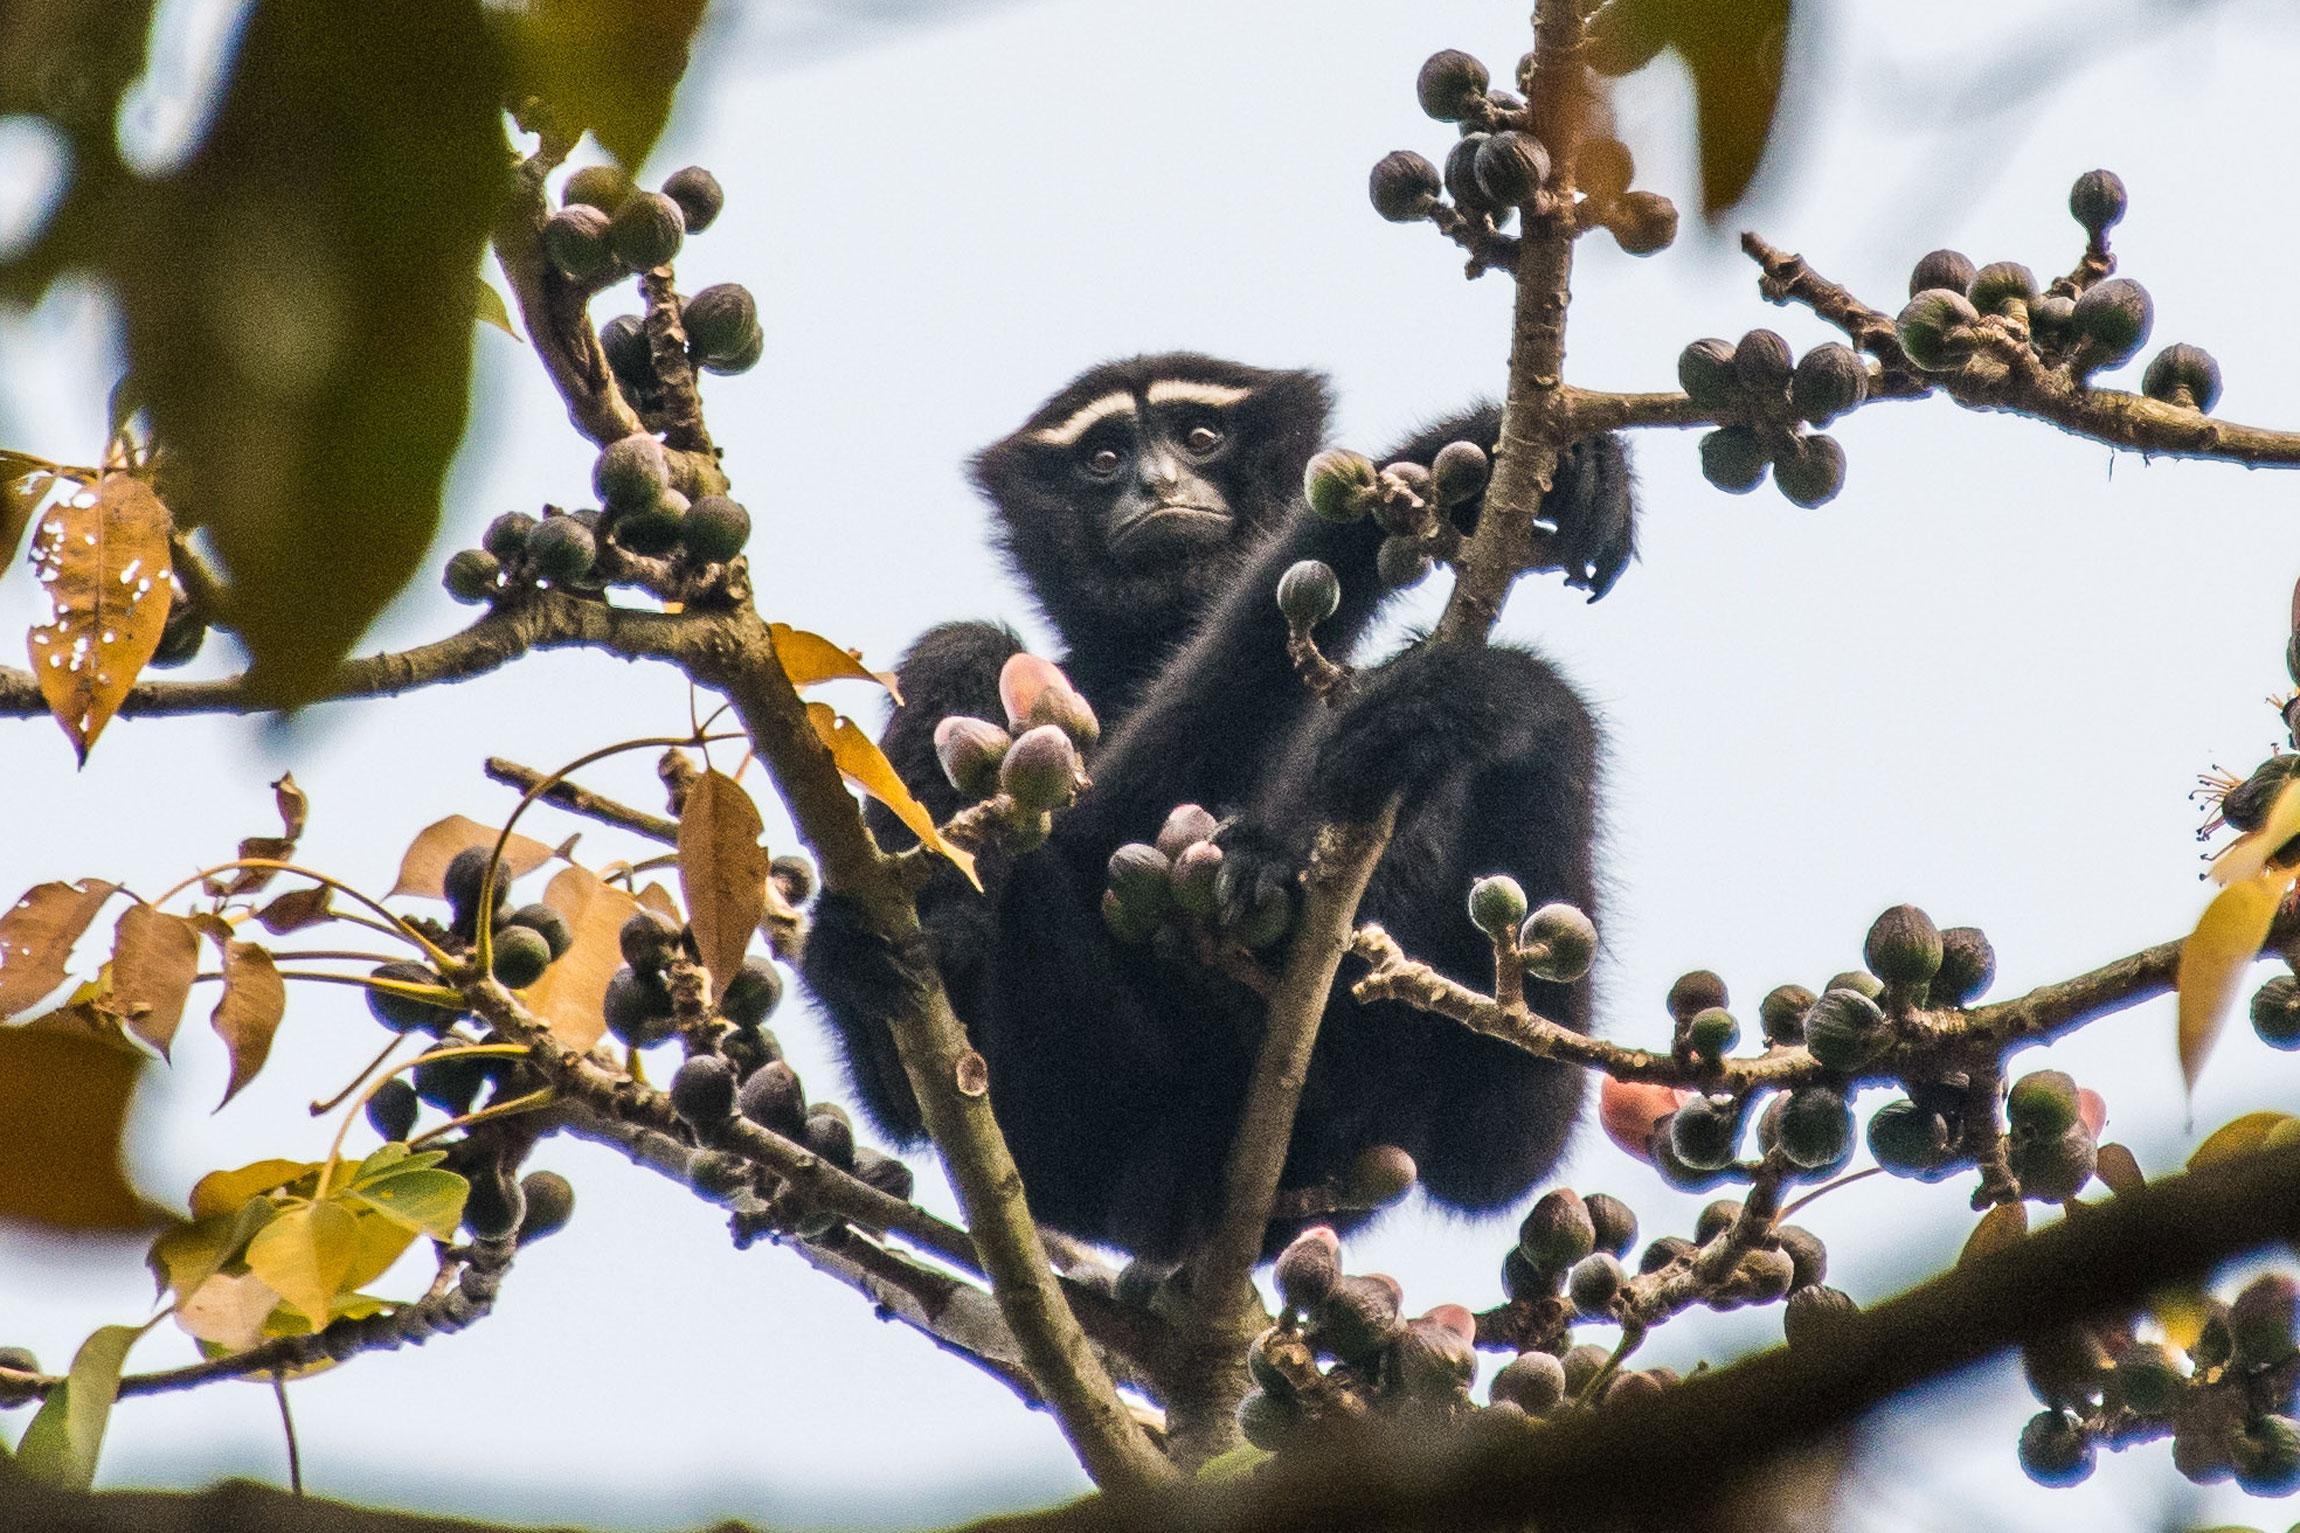 India Wildlife Tours Highlight - A Hoolock gibbon